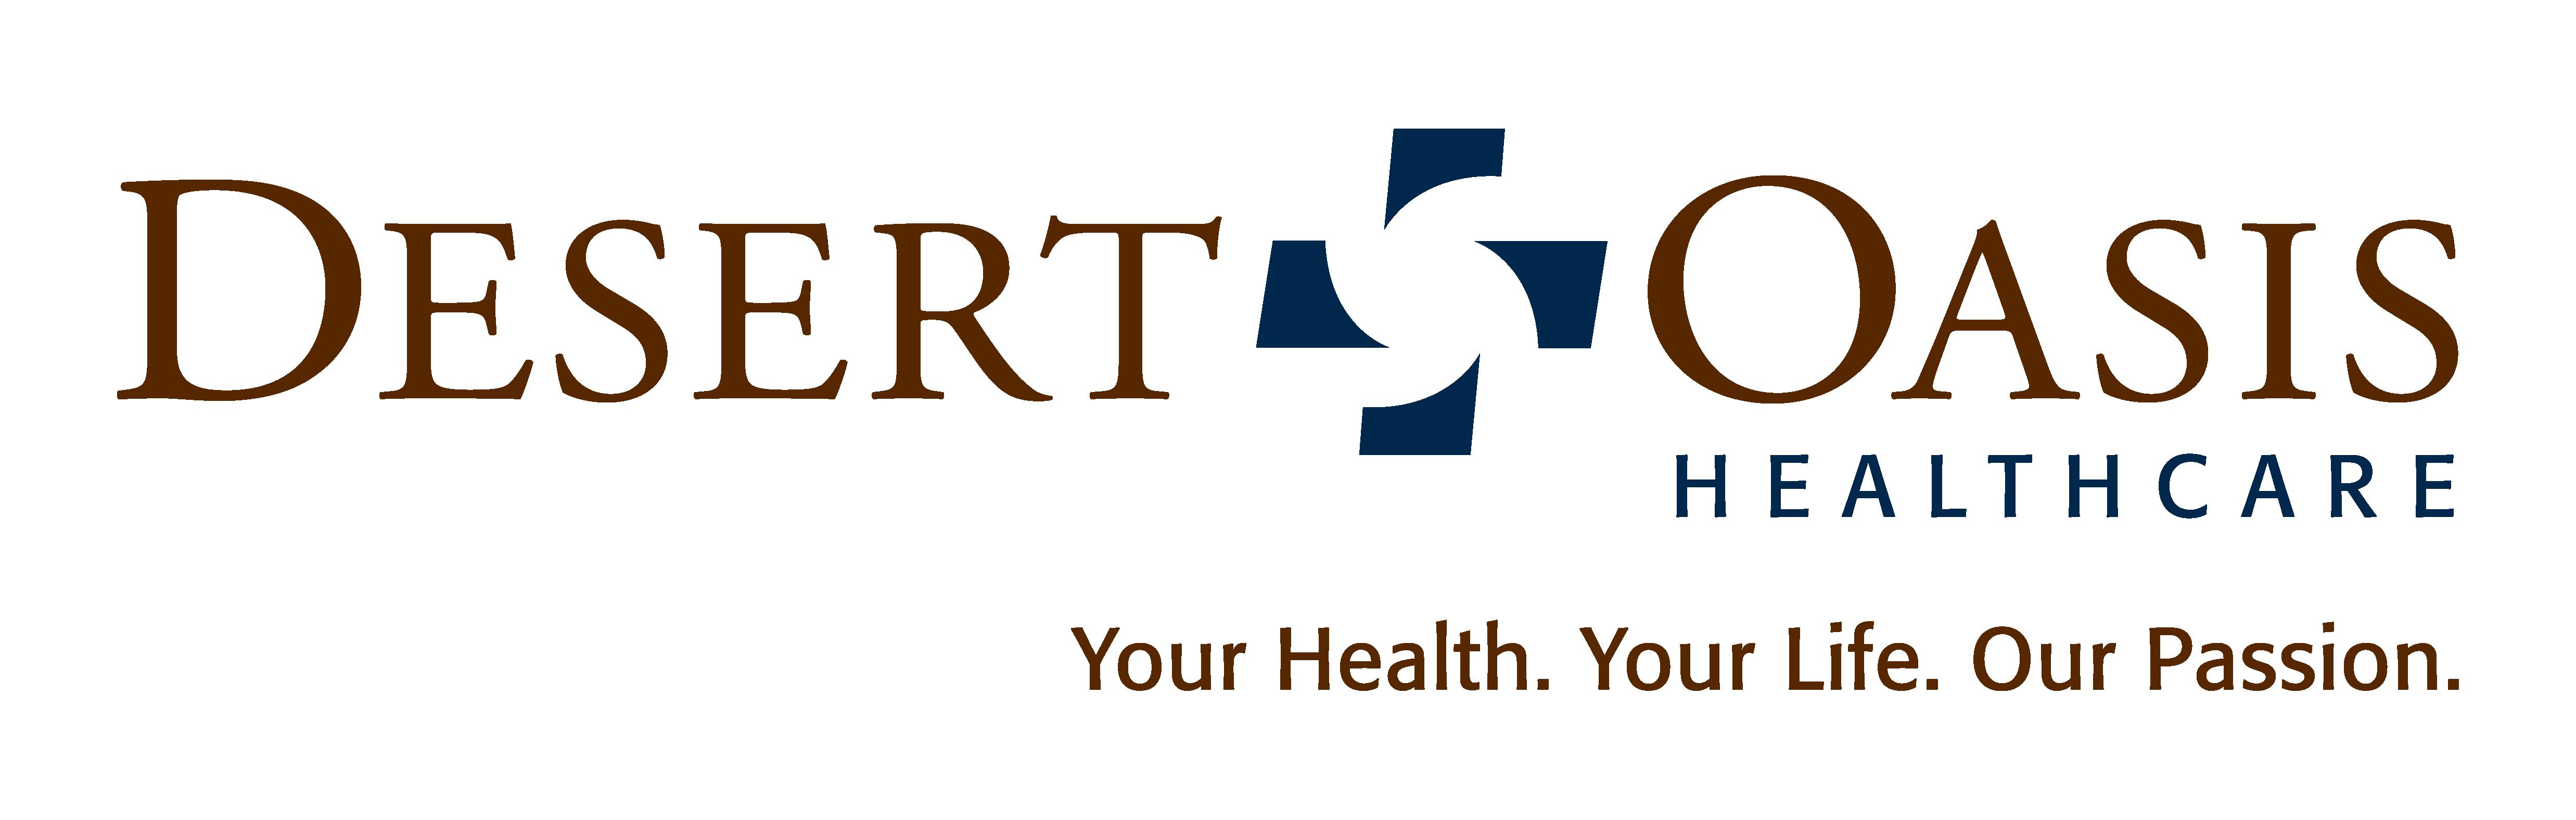 Desert Oasis Healthcare